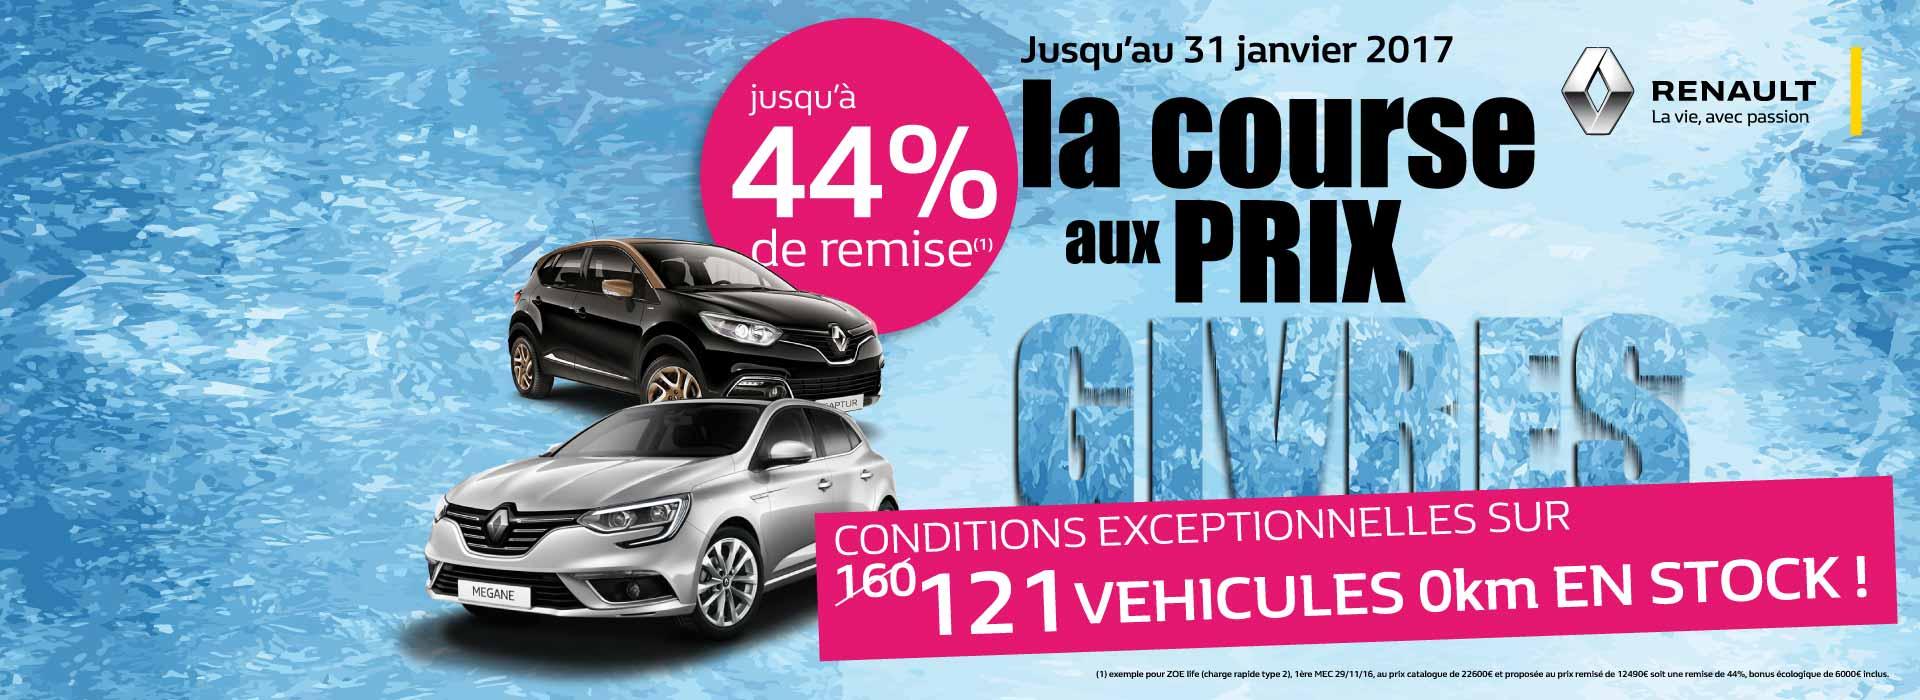 Renault villemomble concessionnaire garage seine for Garage peugeot villemomble